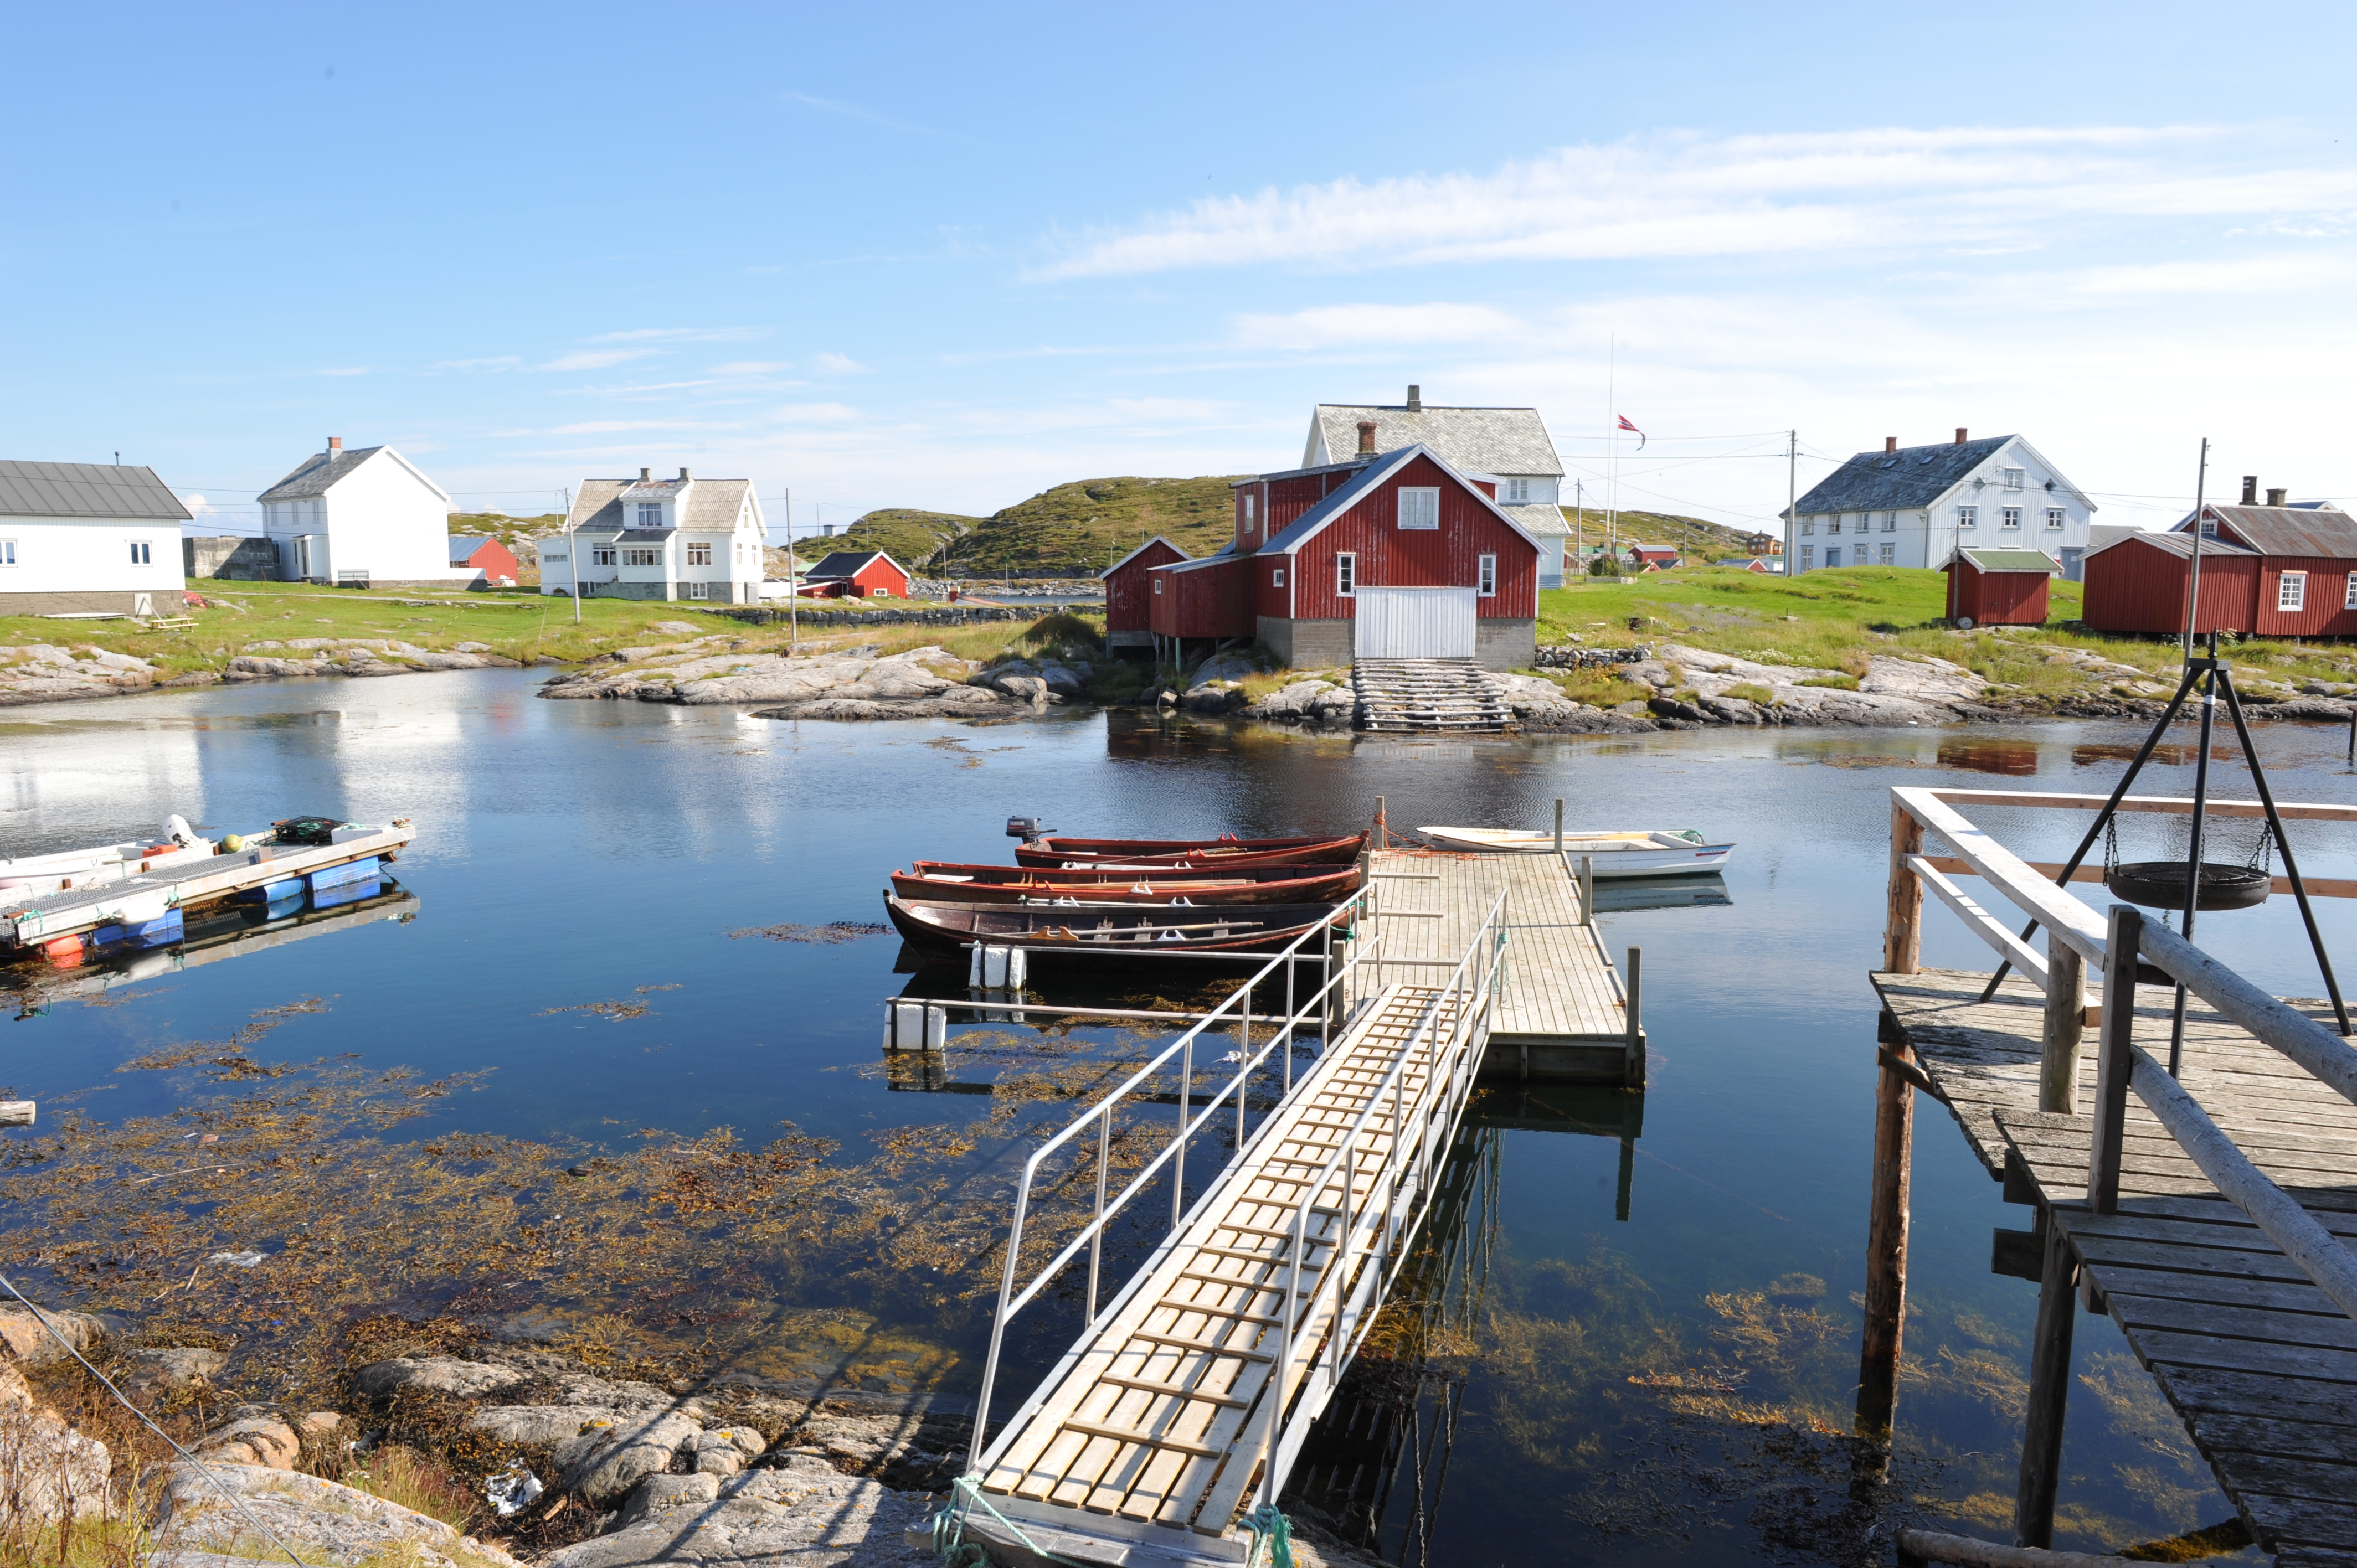 Traditional fishing village in Norway, Sør-Gjæslingan.